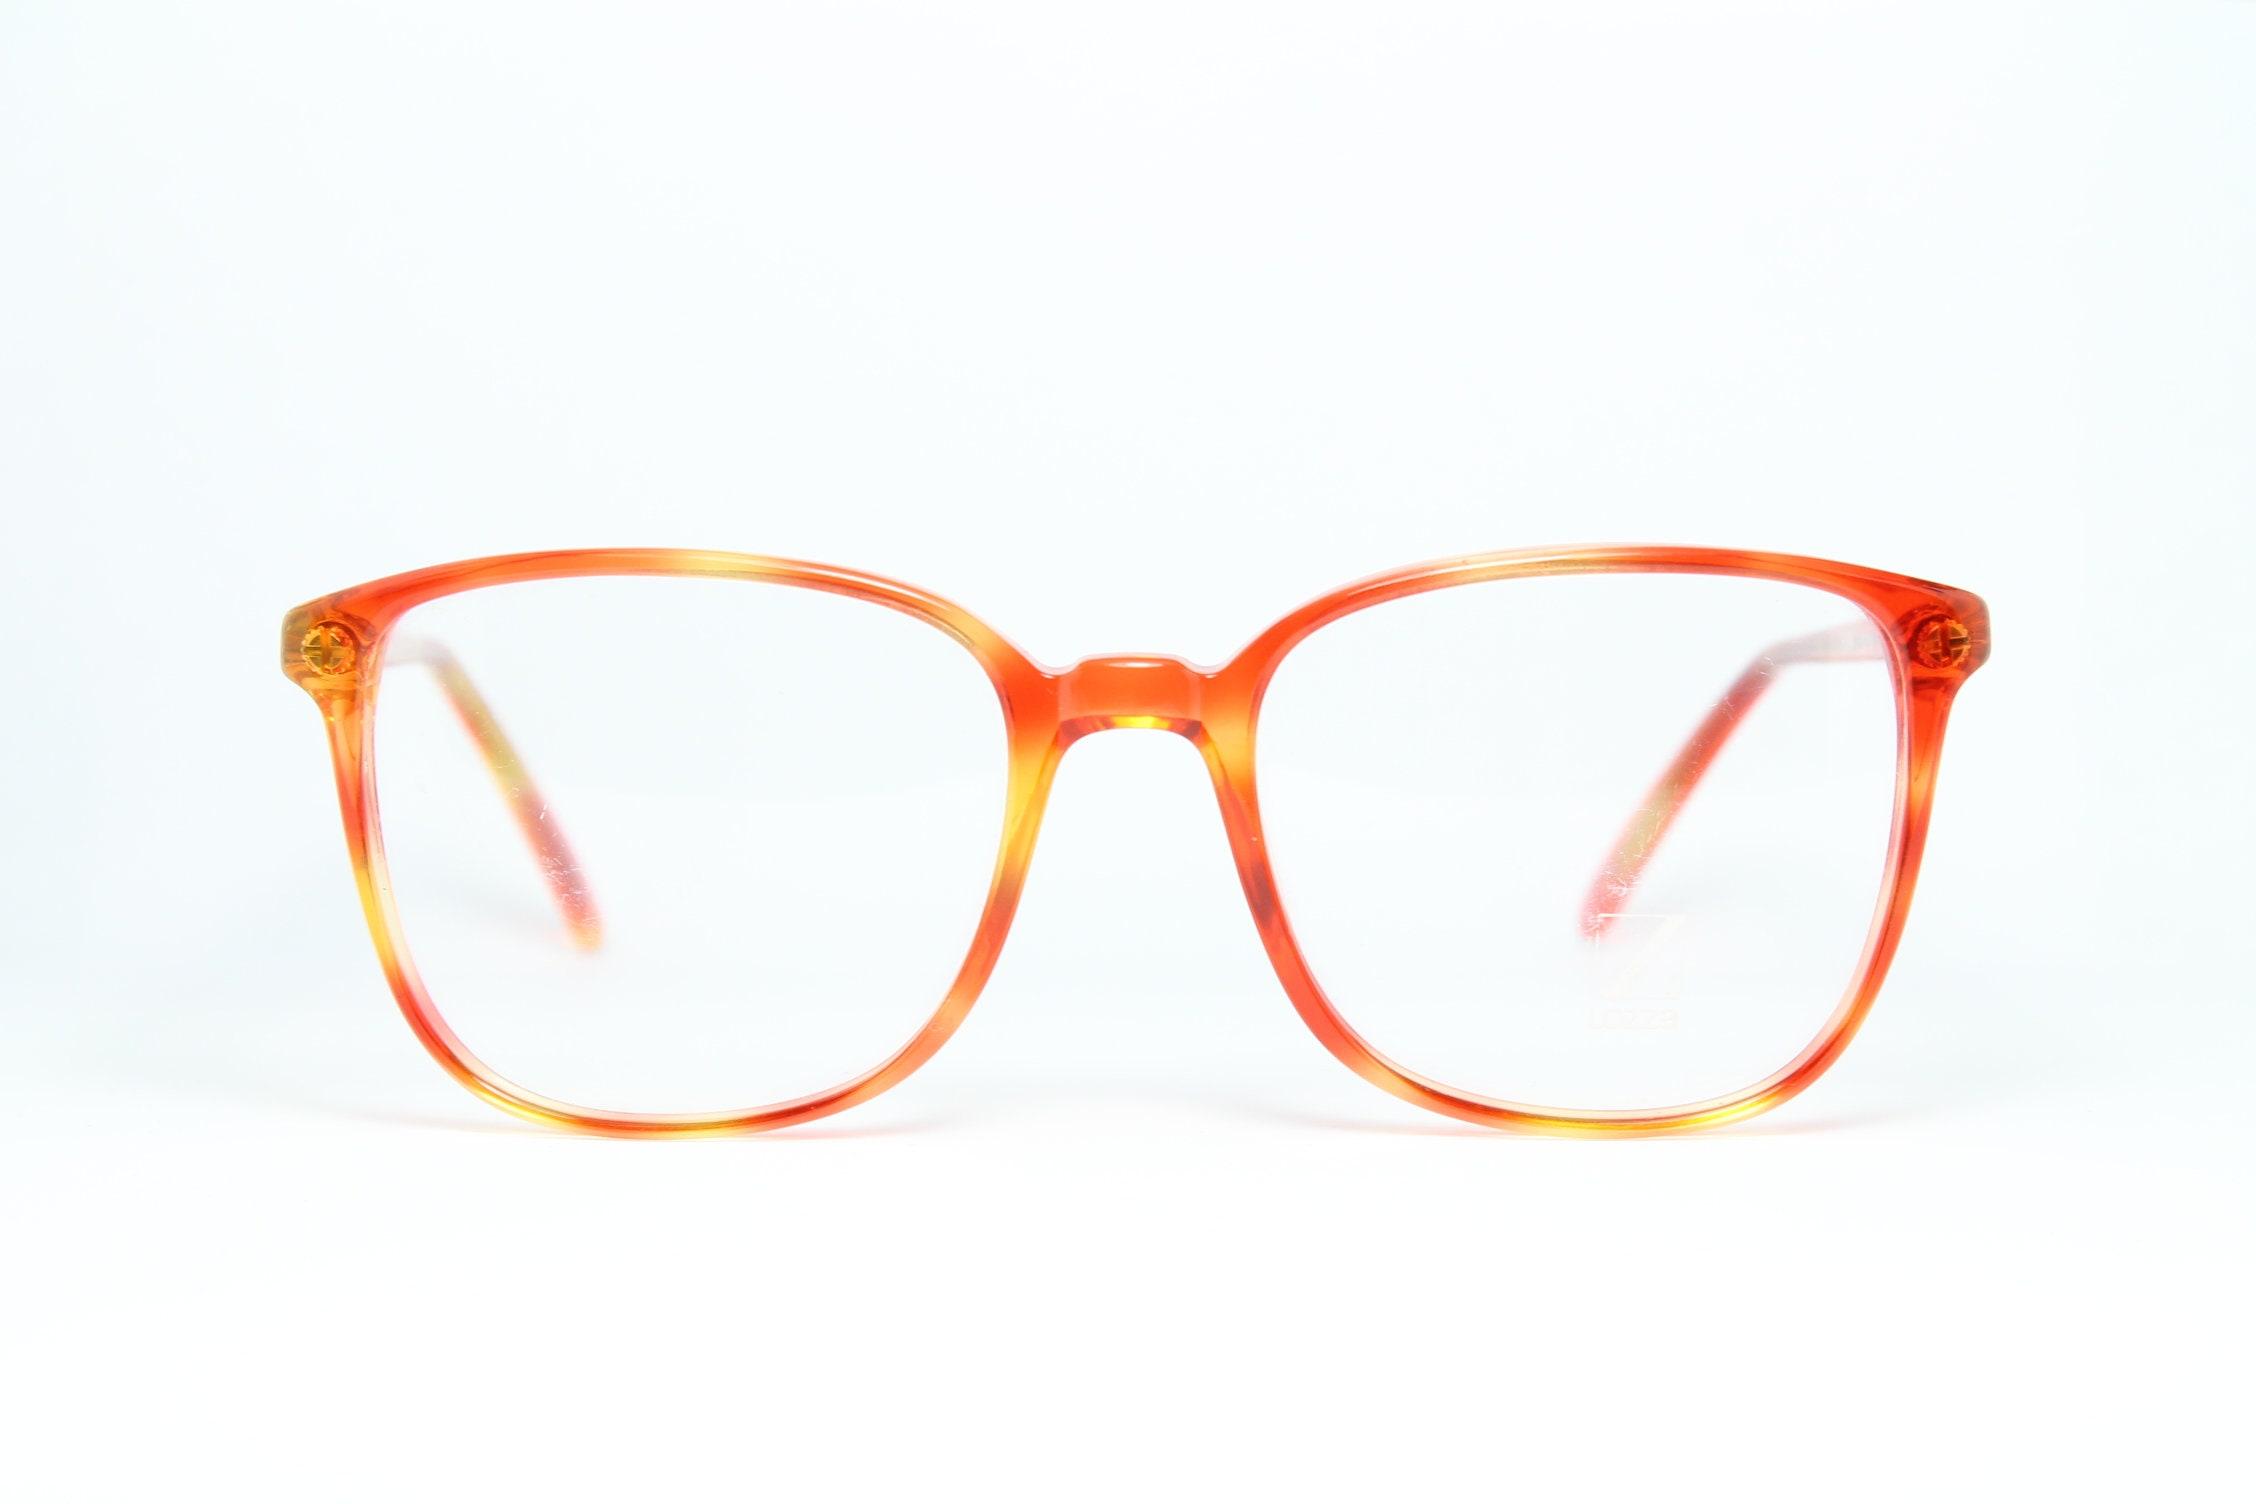 8e8807e4c6c5b7 LOZZA Vintage Brille Eyeglasses Lunettes Occhiali Gafas Bril